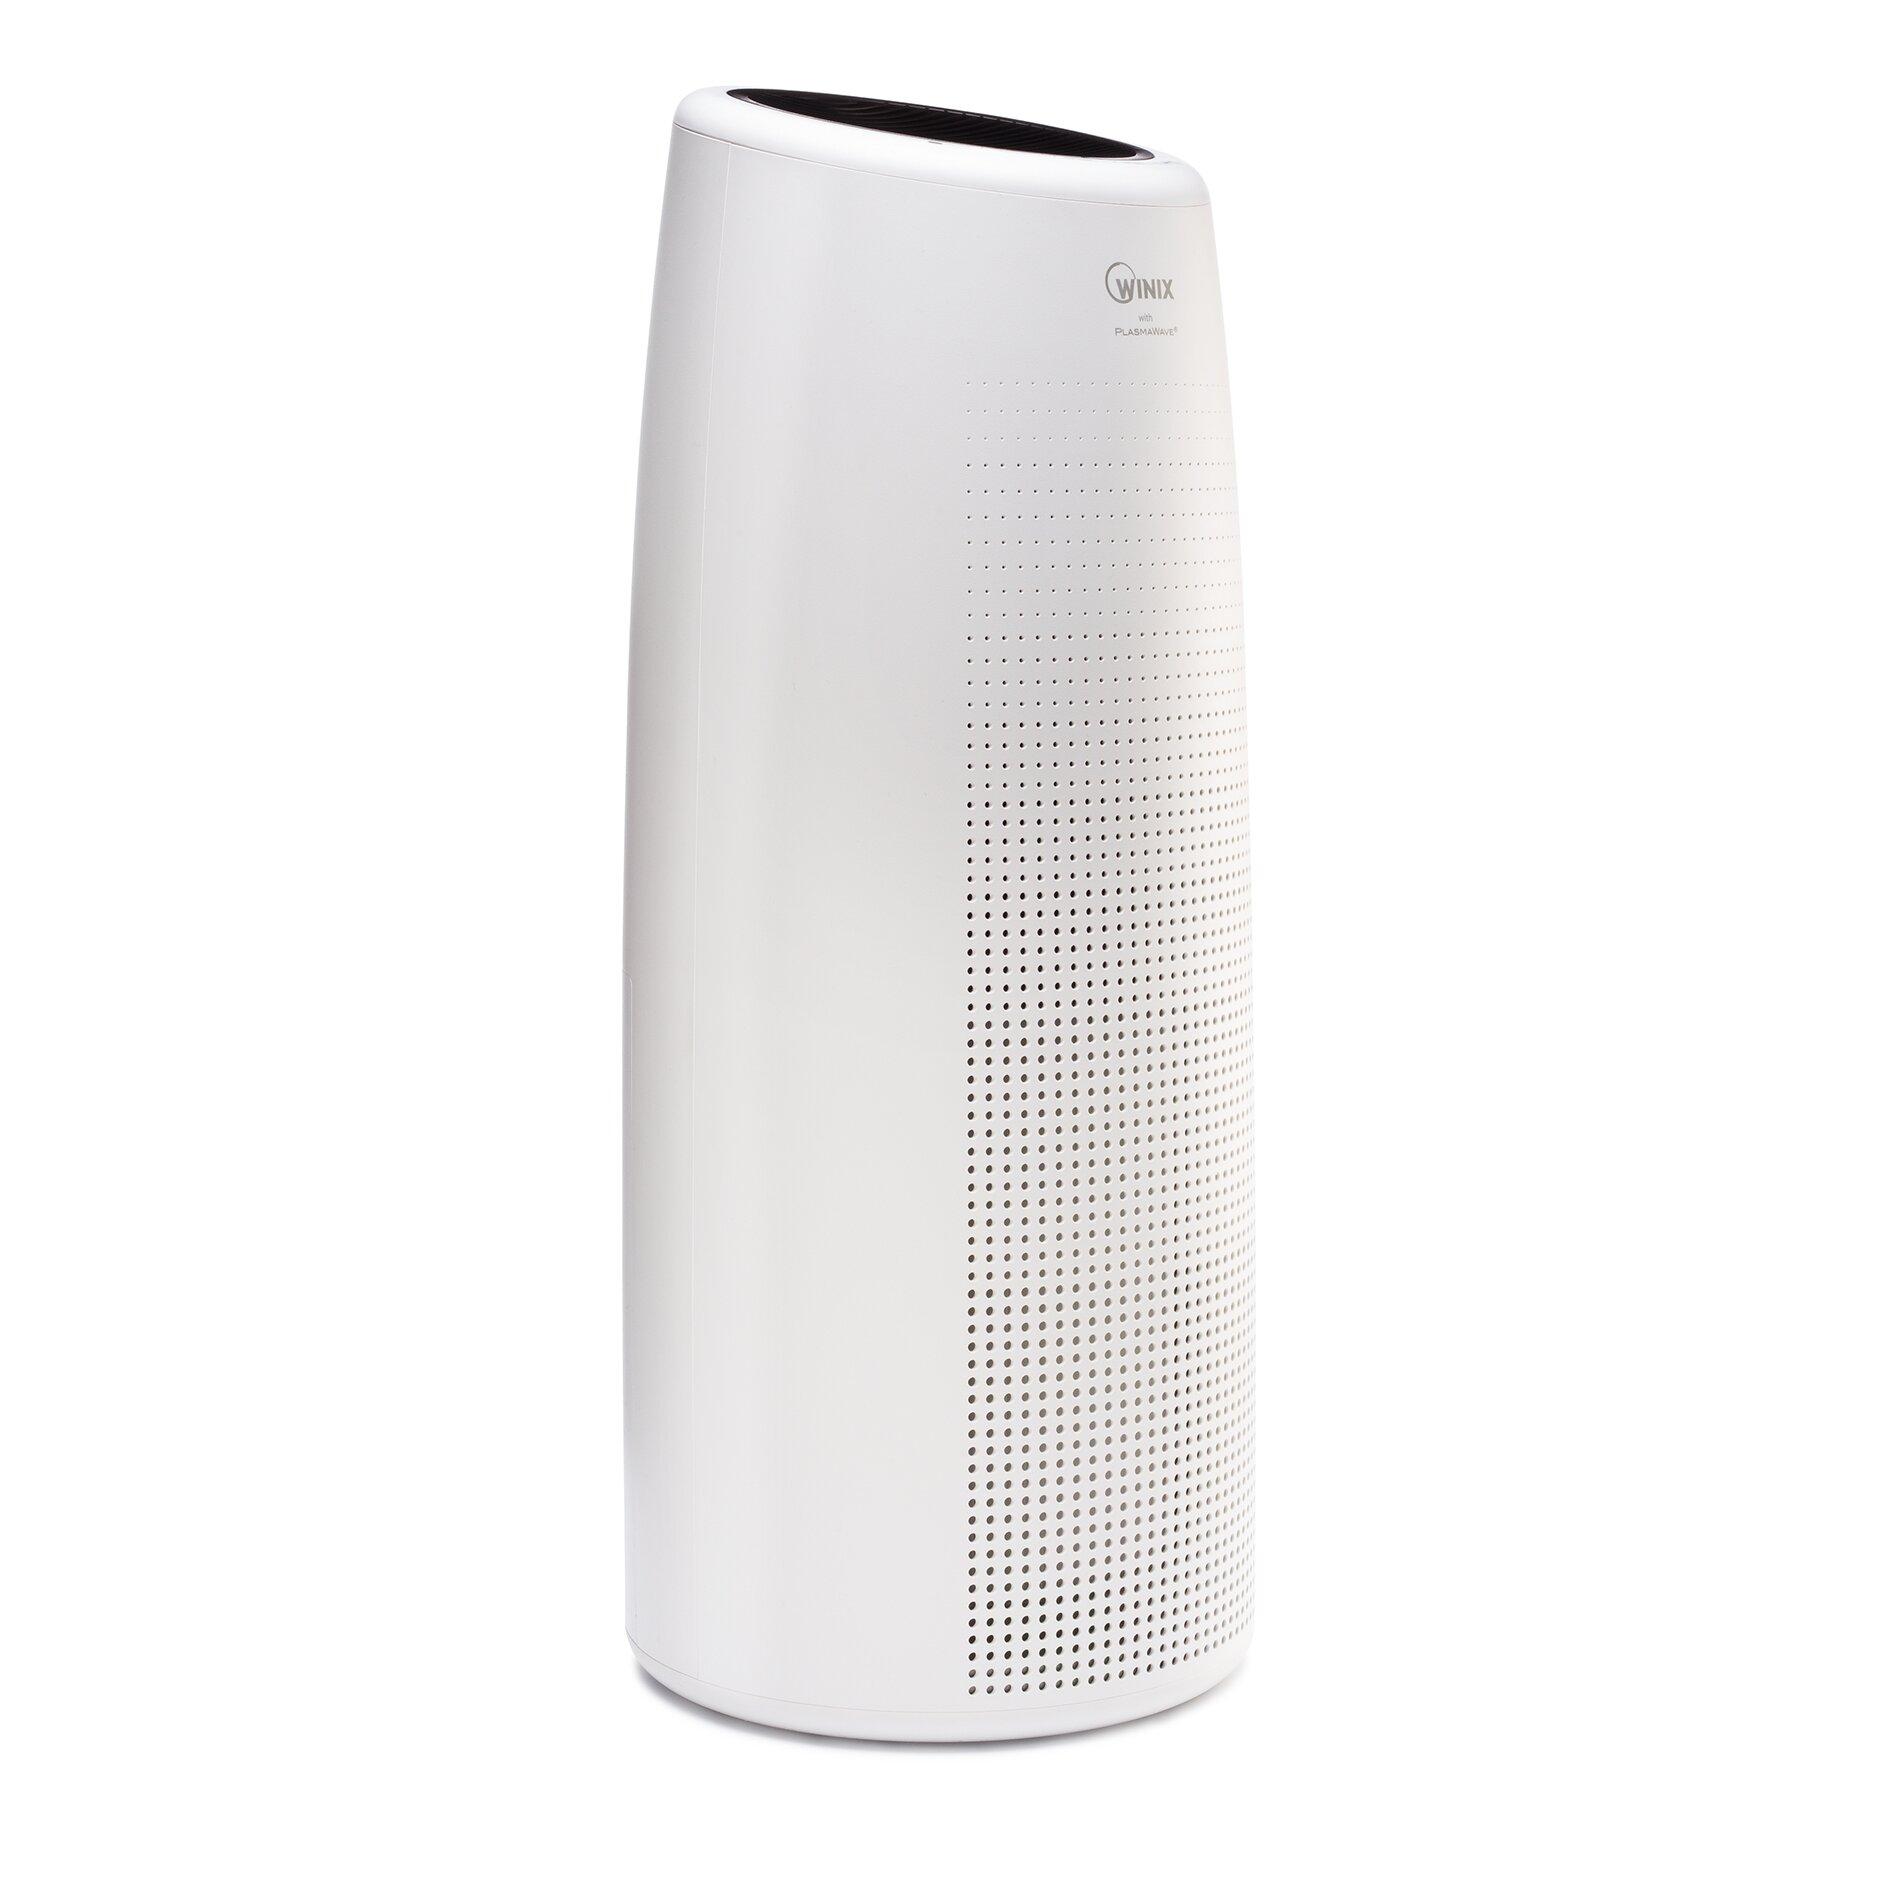 Winix Nk Series Hepa Air Purifier Wayfair